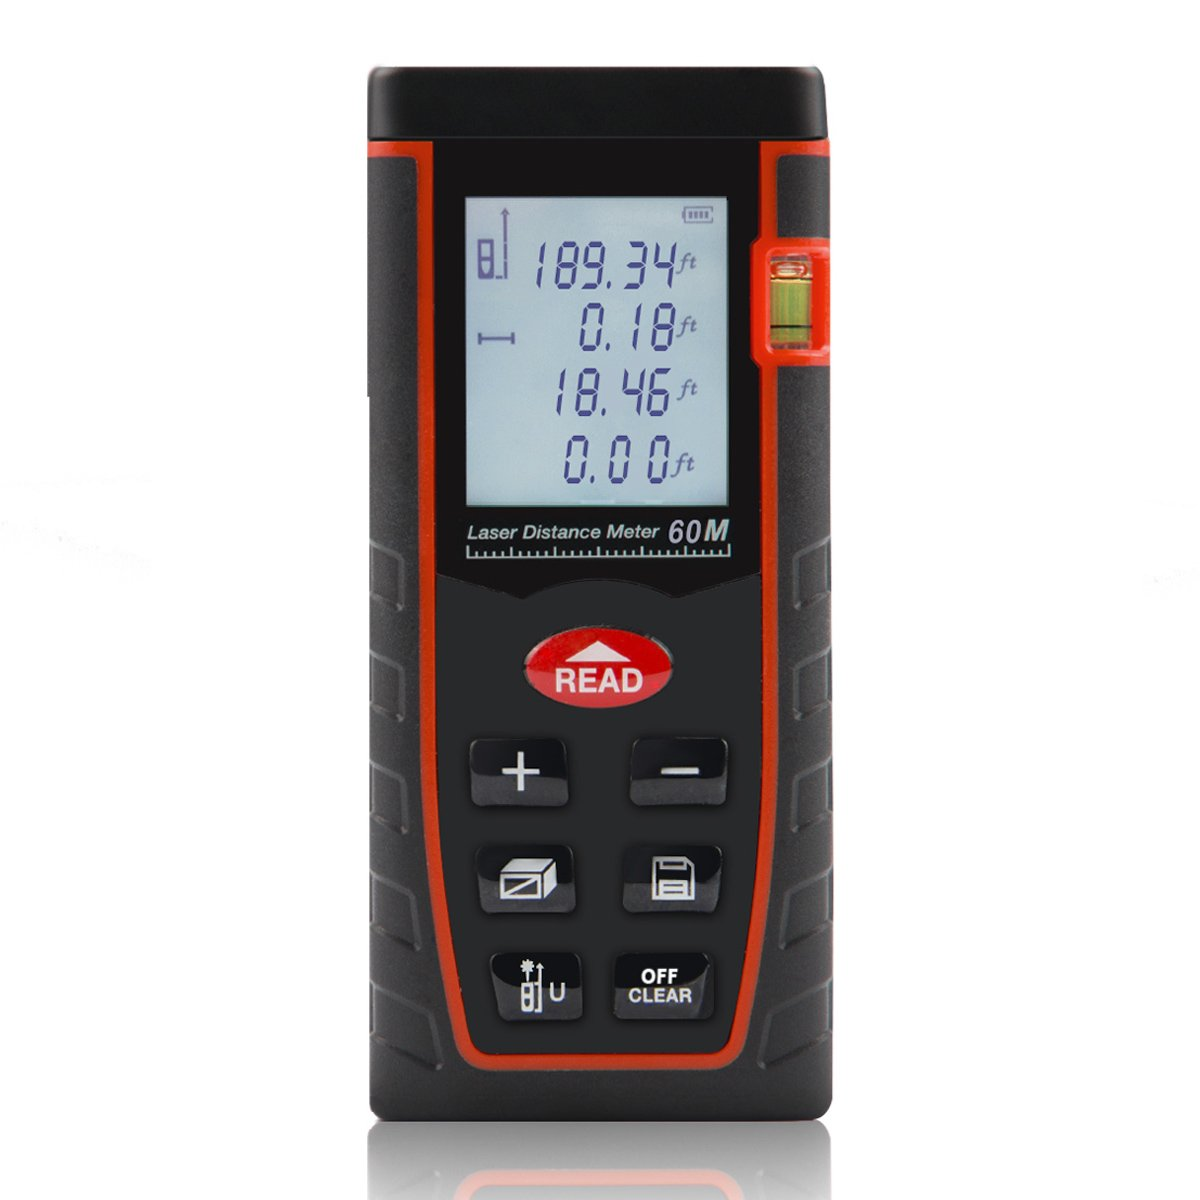 Bosch Japan Glm40 Laser Distance Measurer Meter 131 Feet 40 Meters Business Industrial Measuring Tapes Tools Alberdi Com Mx